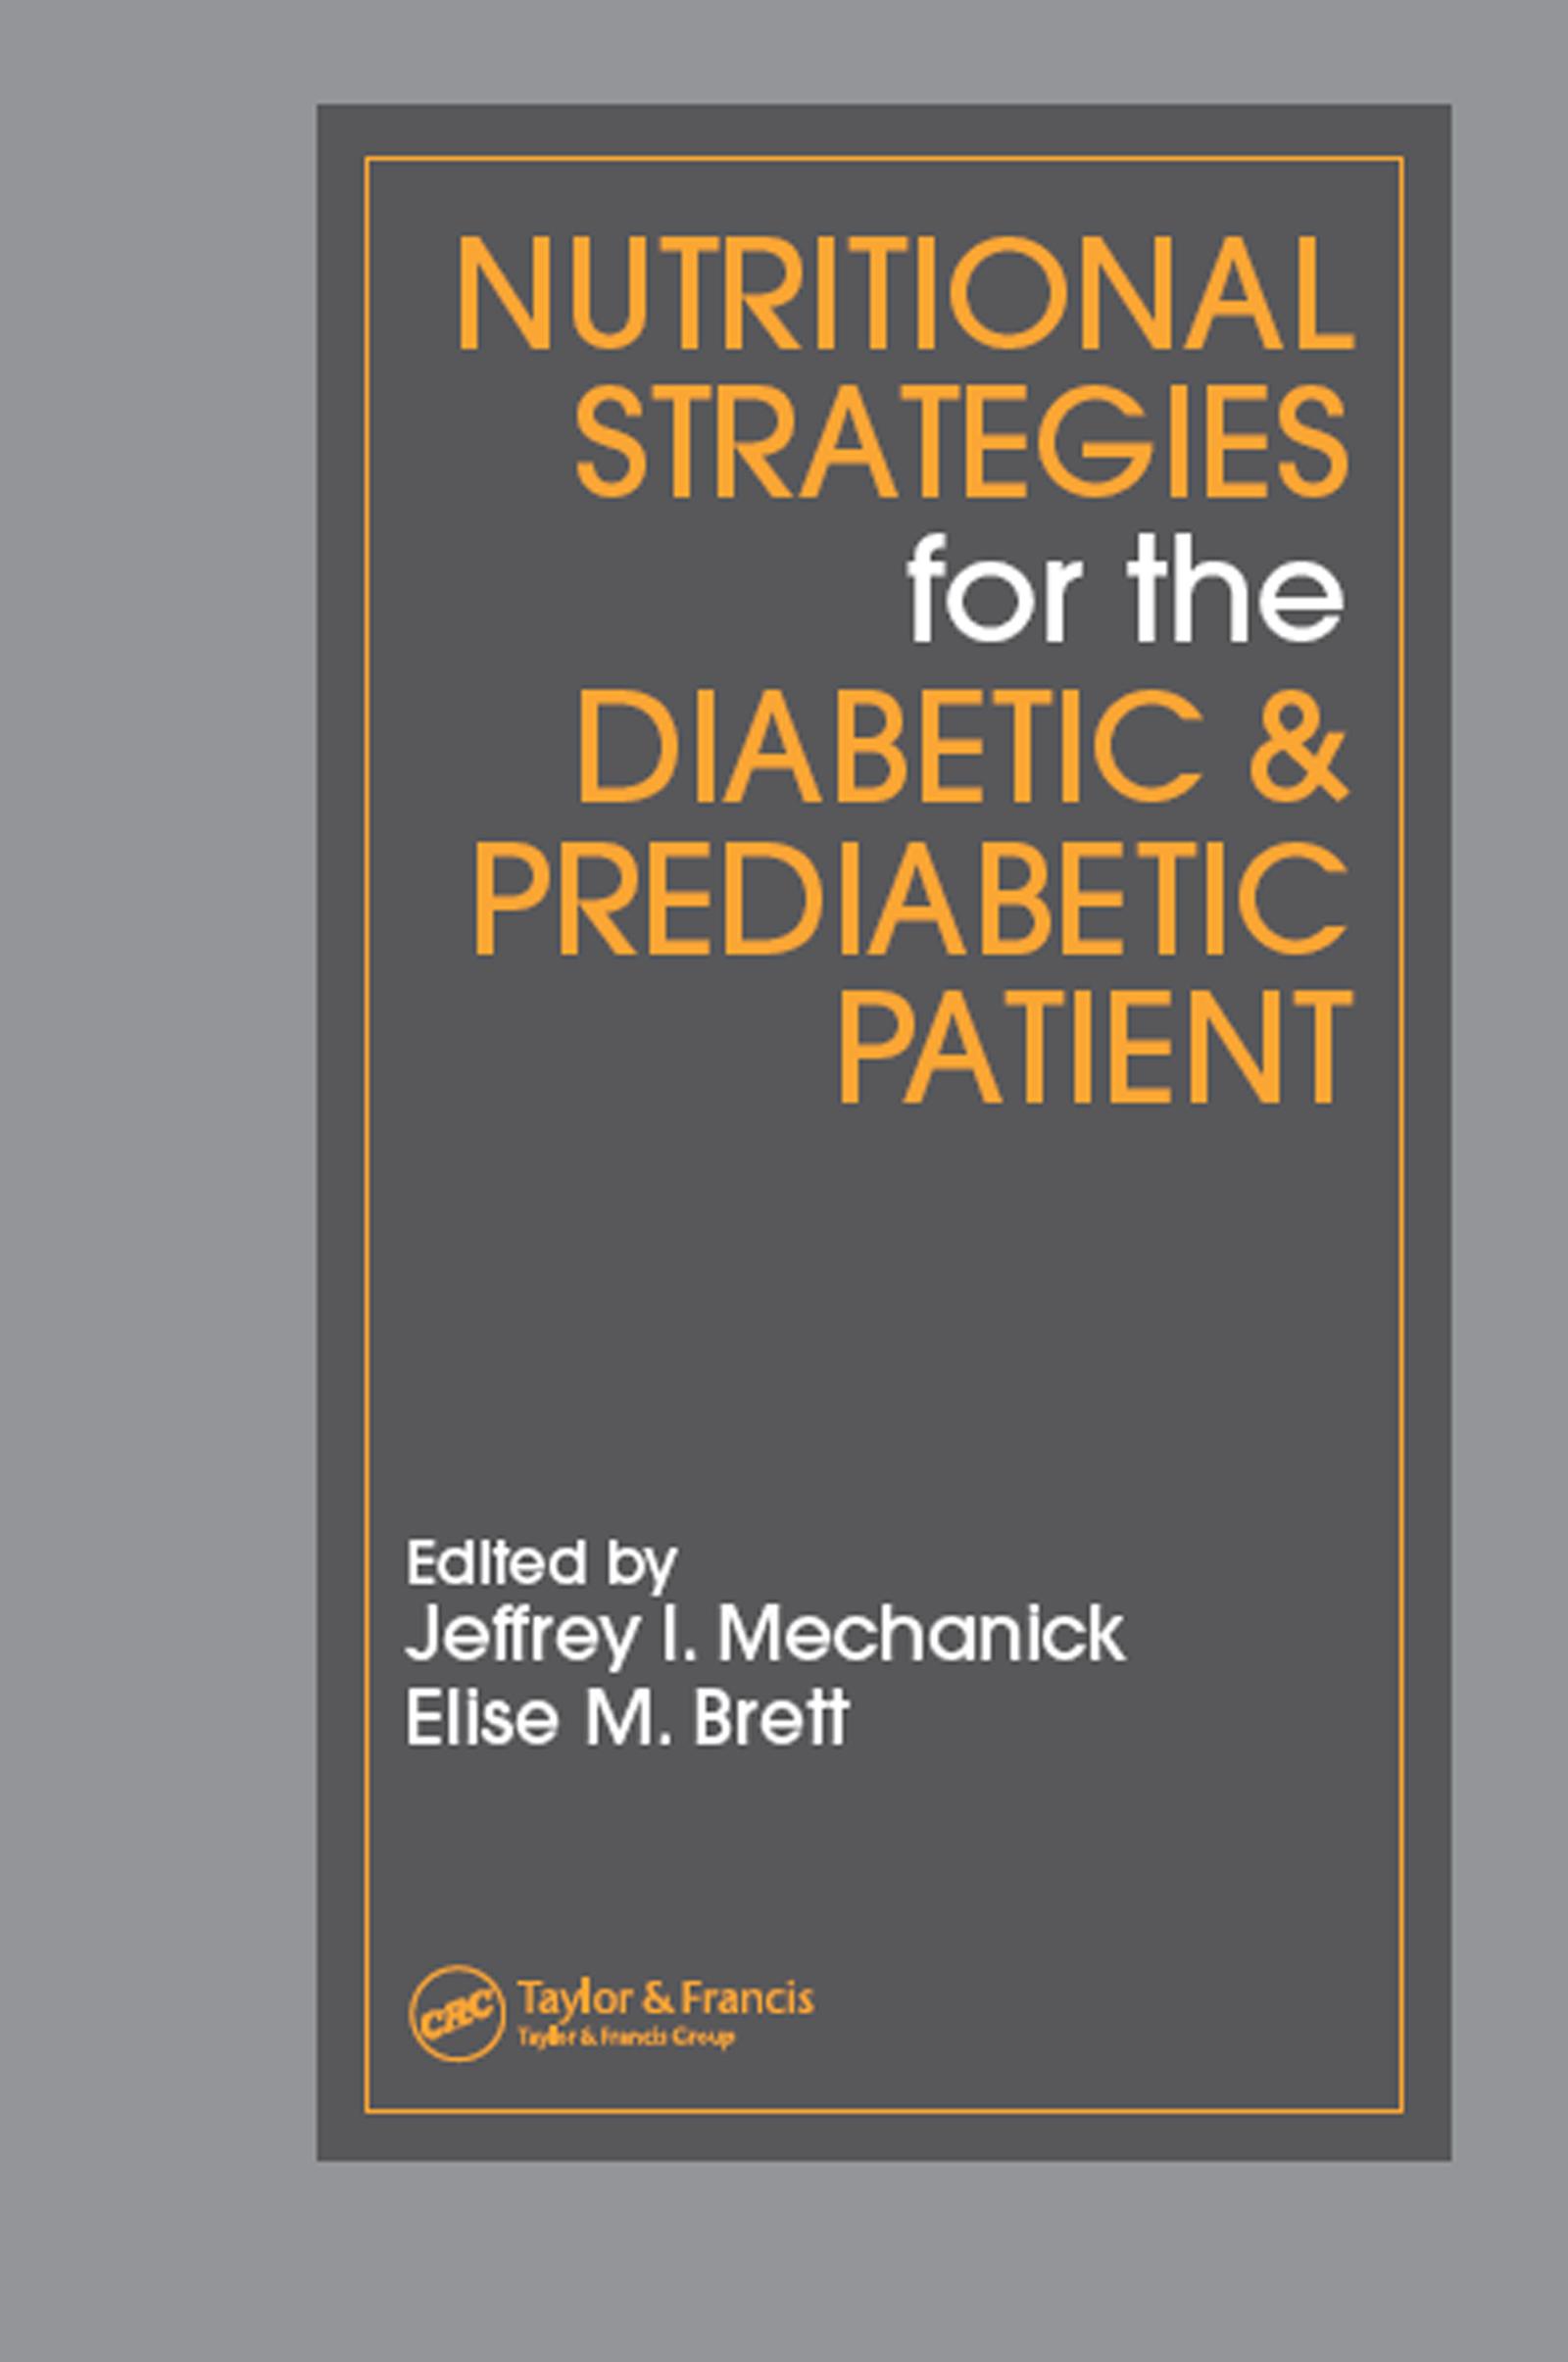 Nutritional Strategies for the Diabetic & Prediabetic Patient